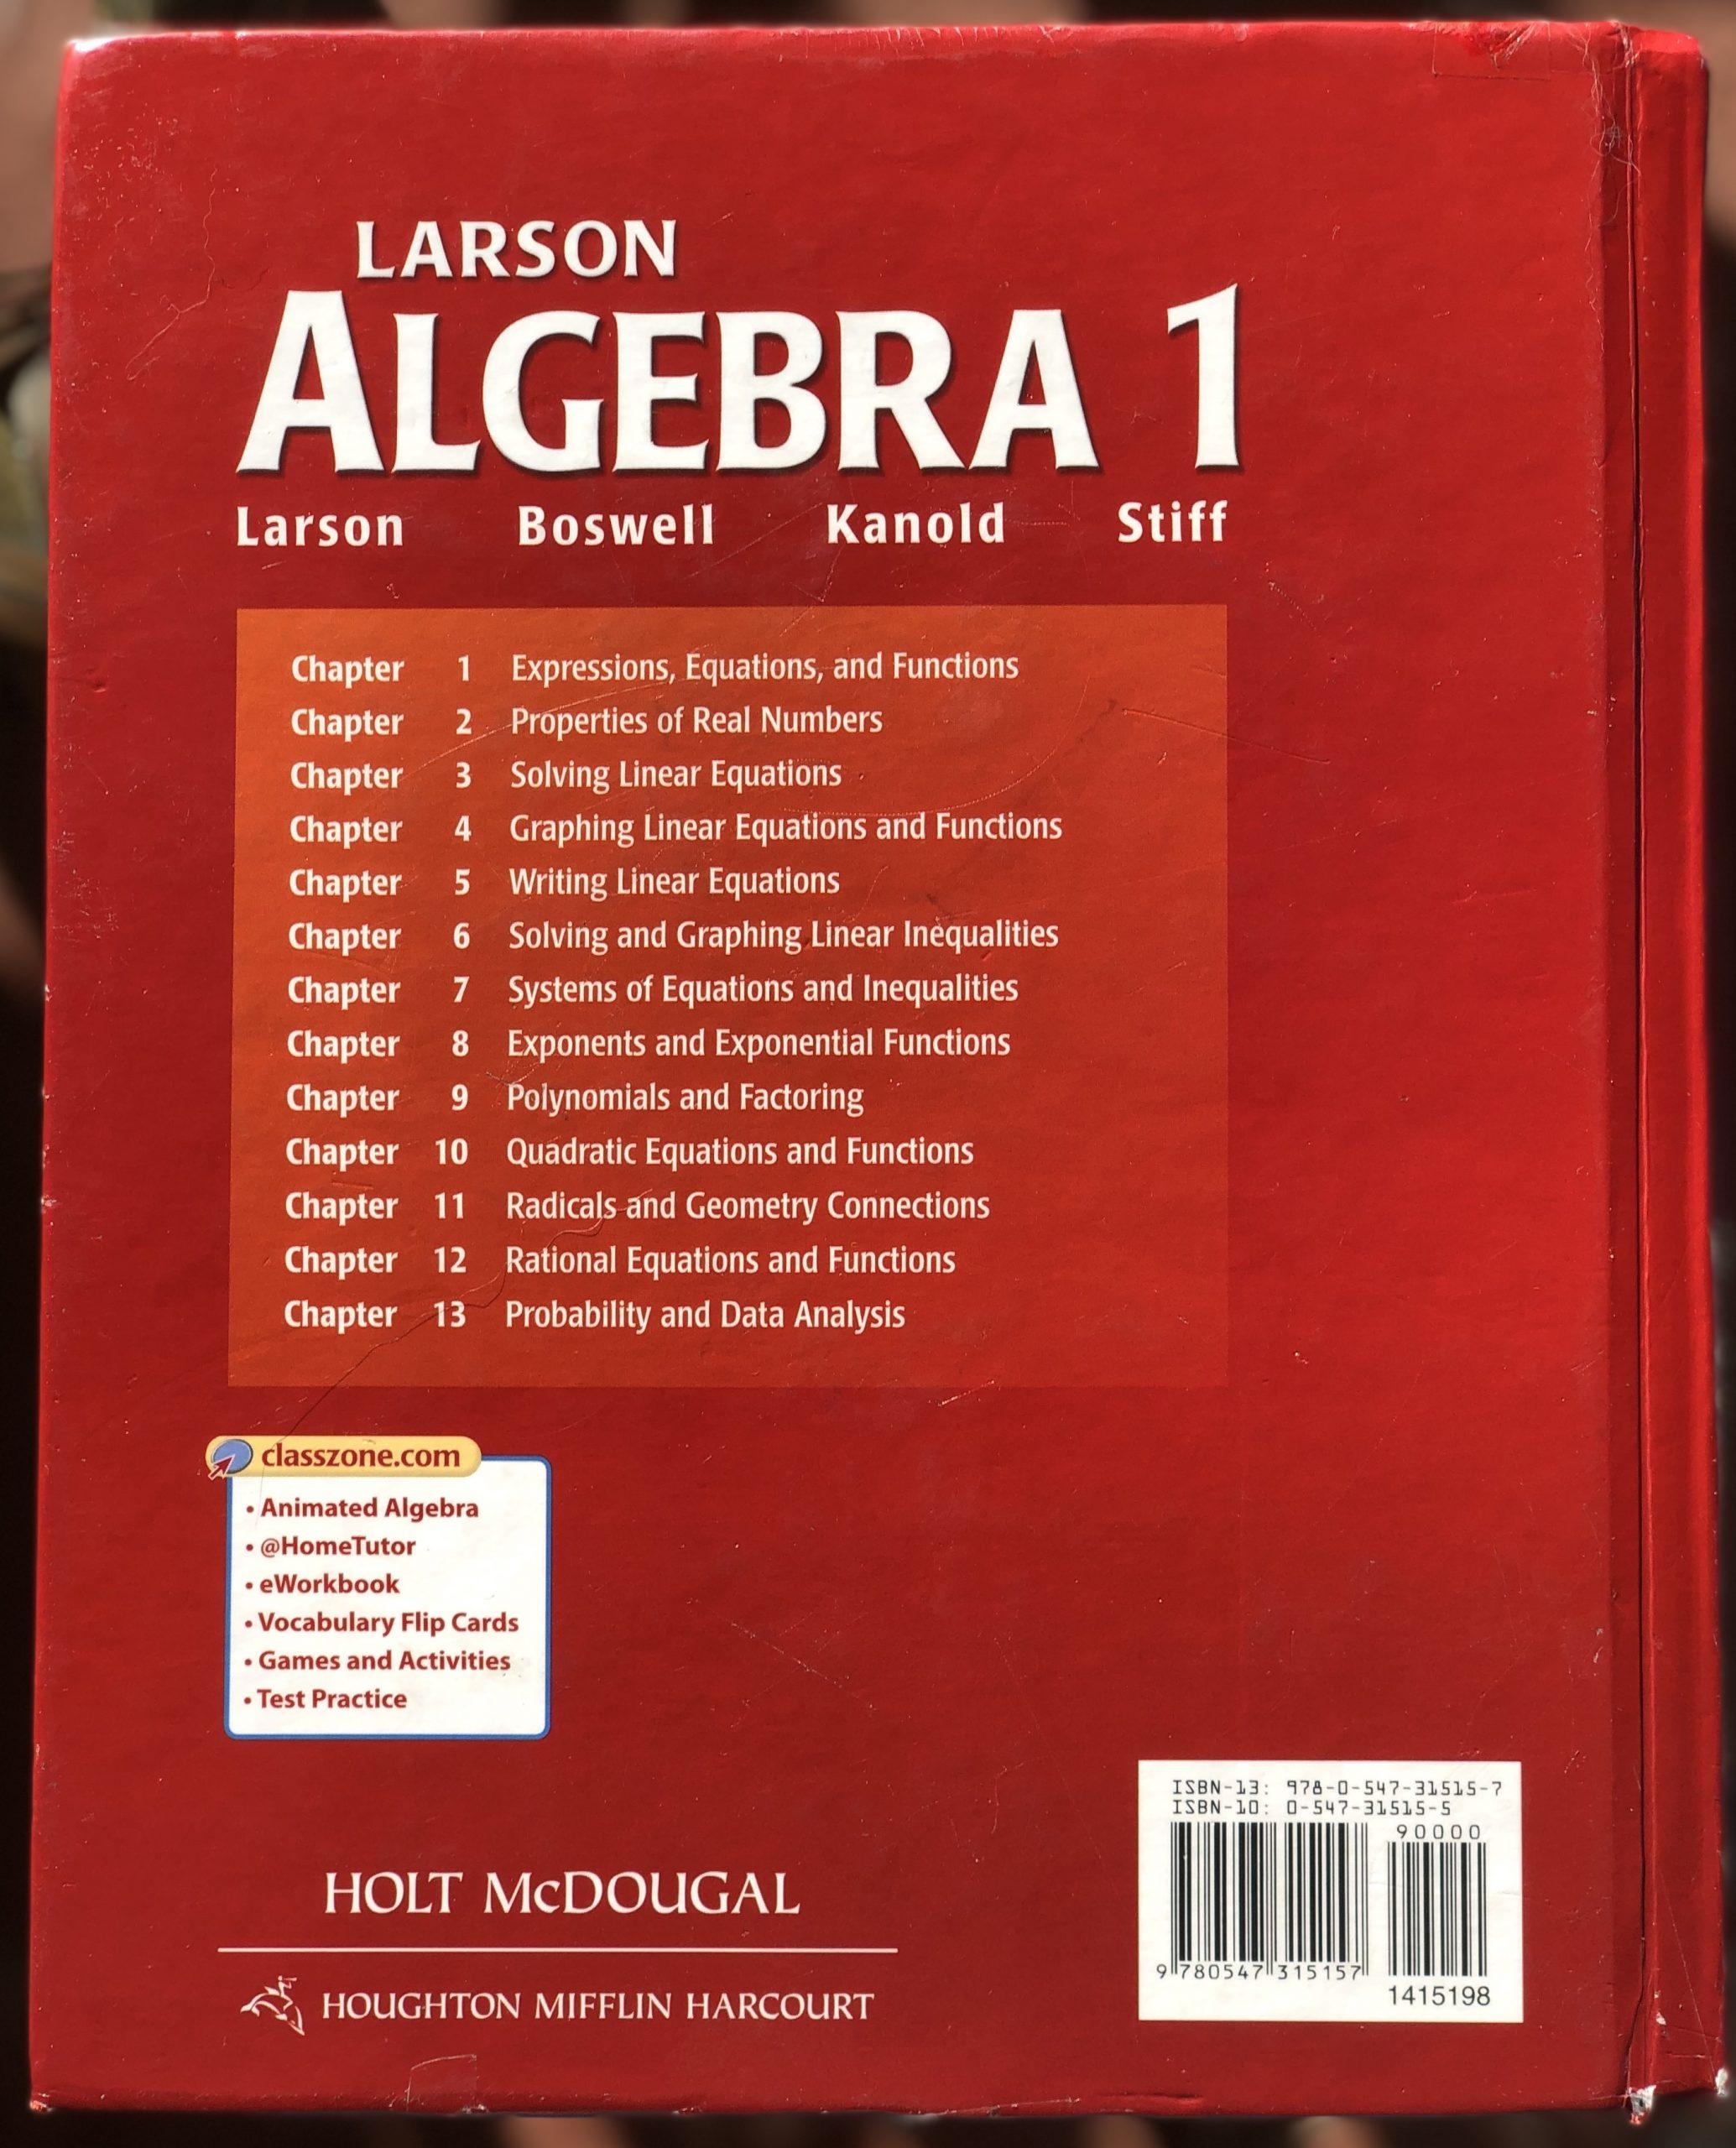 Holt Mcdougal Larson Algebra 1 Student Edition